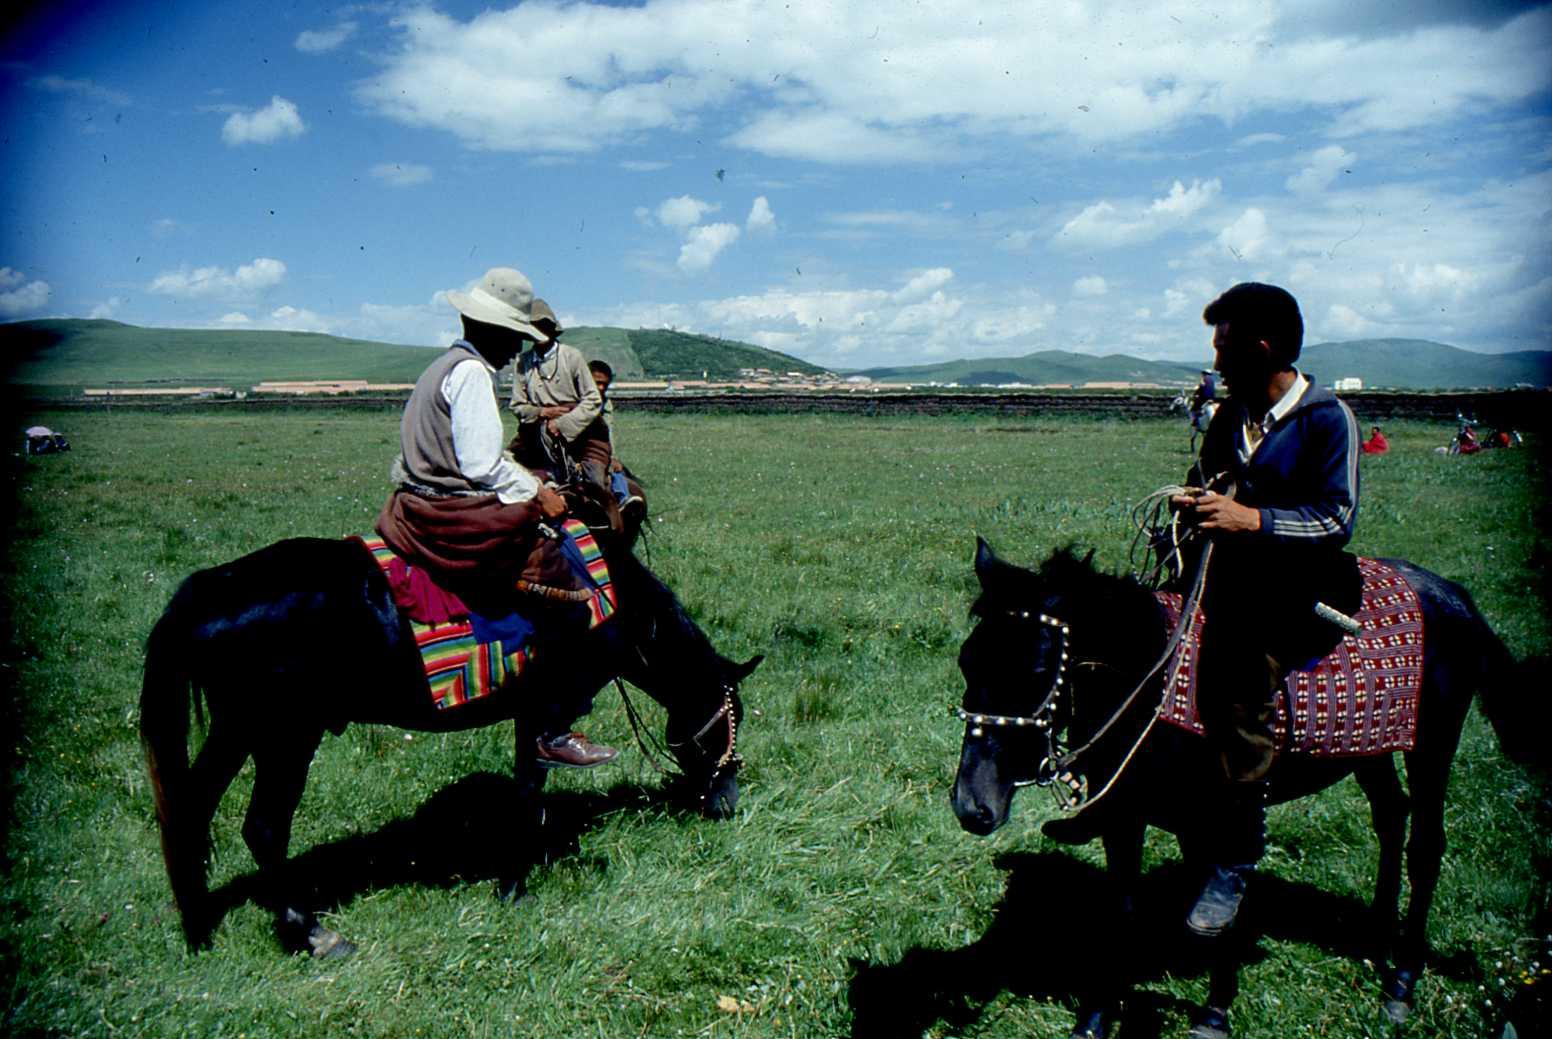 1991_07_Xiahe-Tibetan_Plateau_Grassland_010